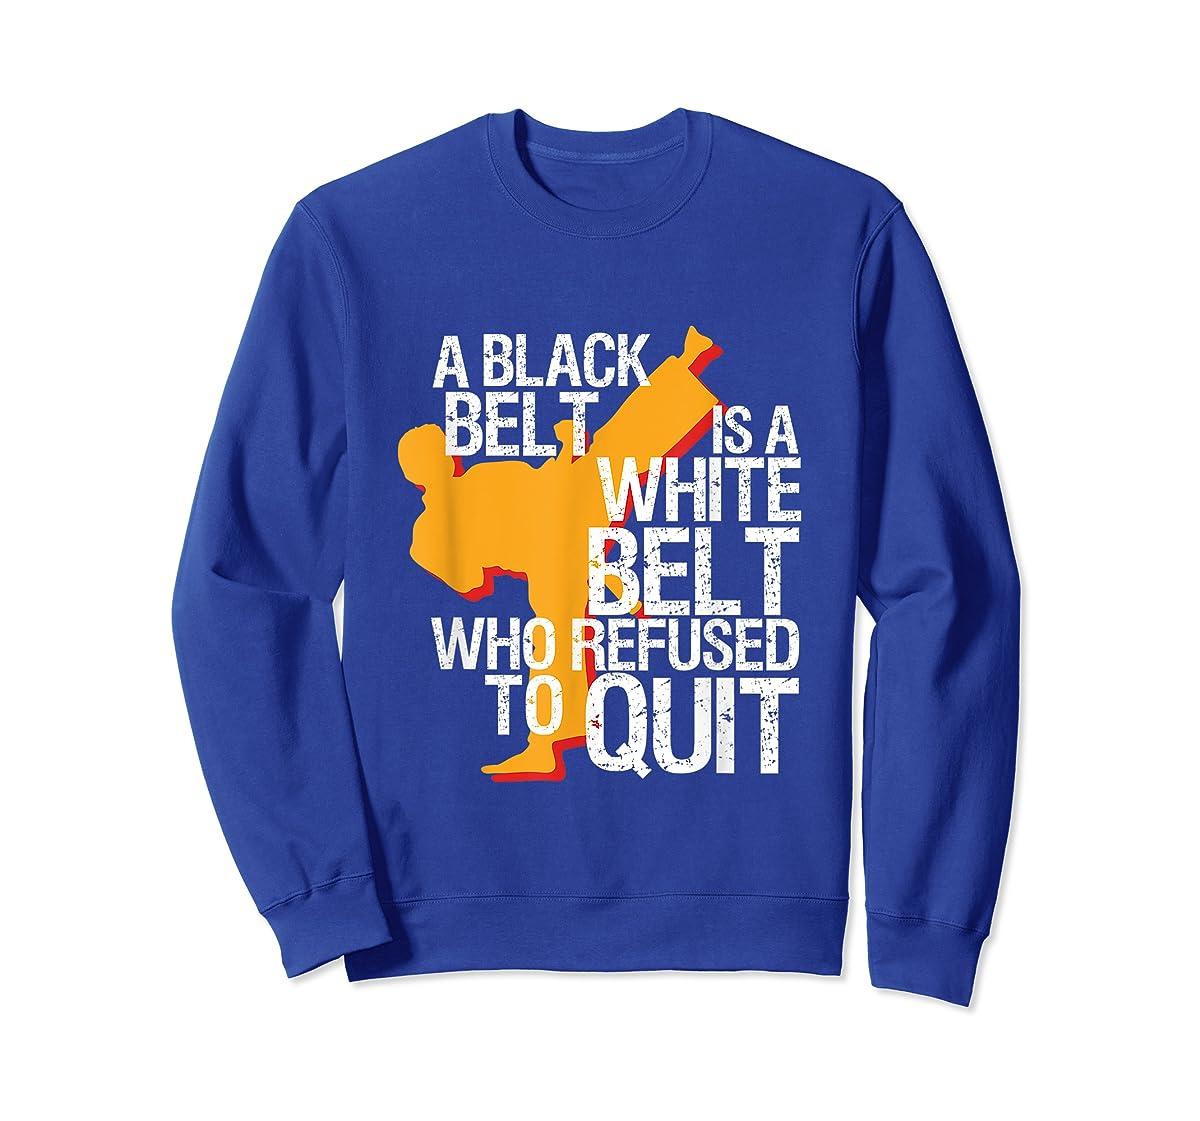 Taekwondo and Karate Black Belt Martial Art Student T-shirt-Sweatshirt-Royal